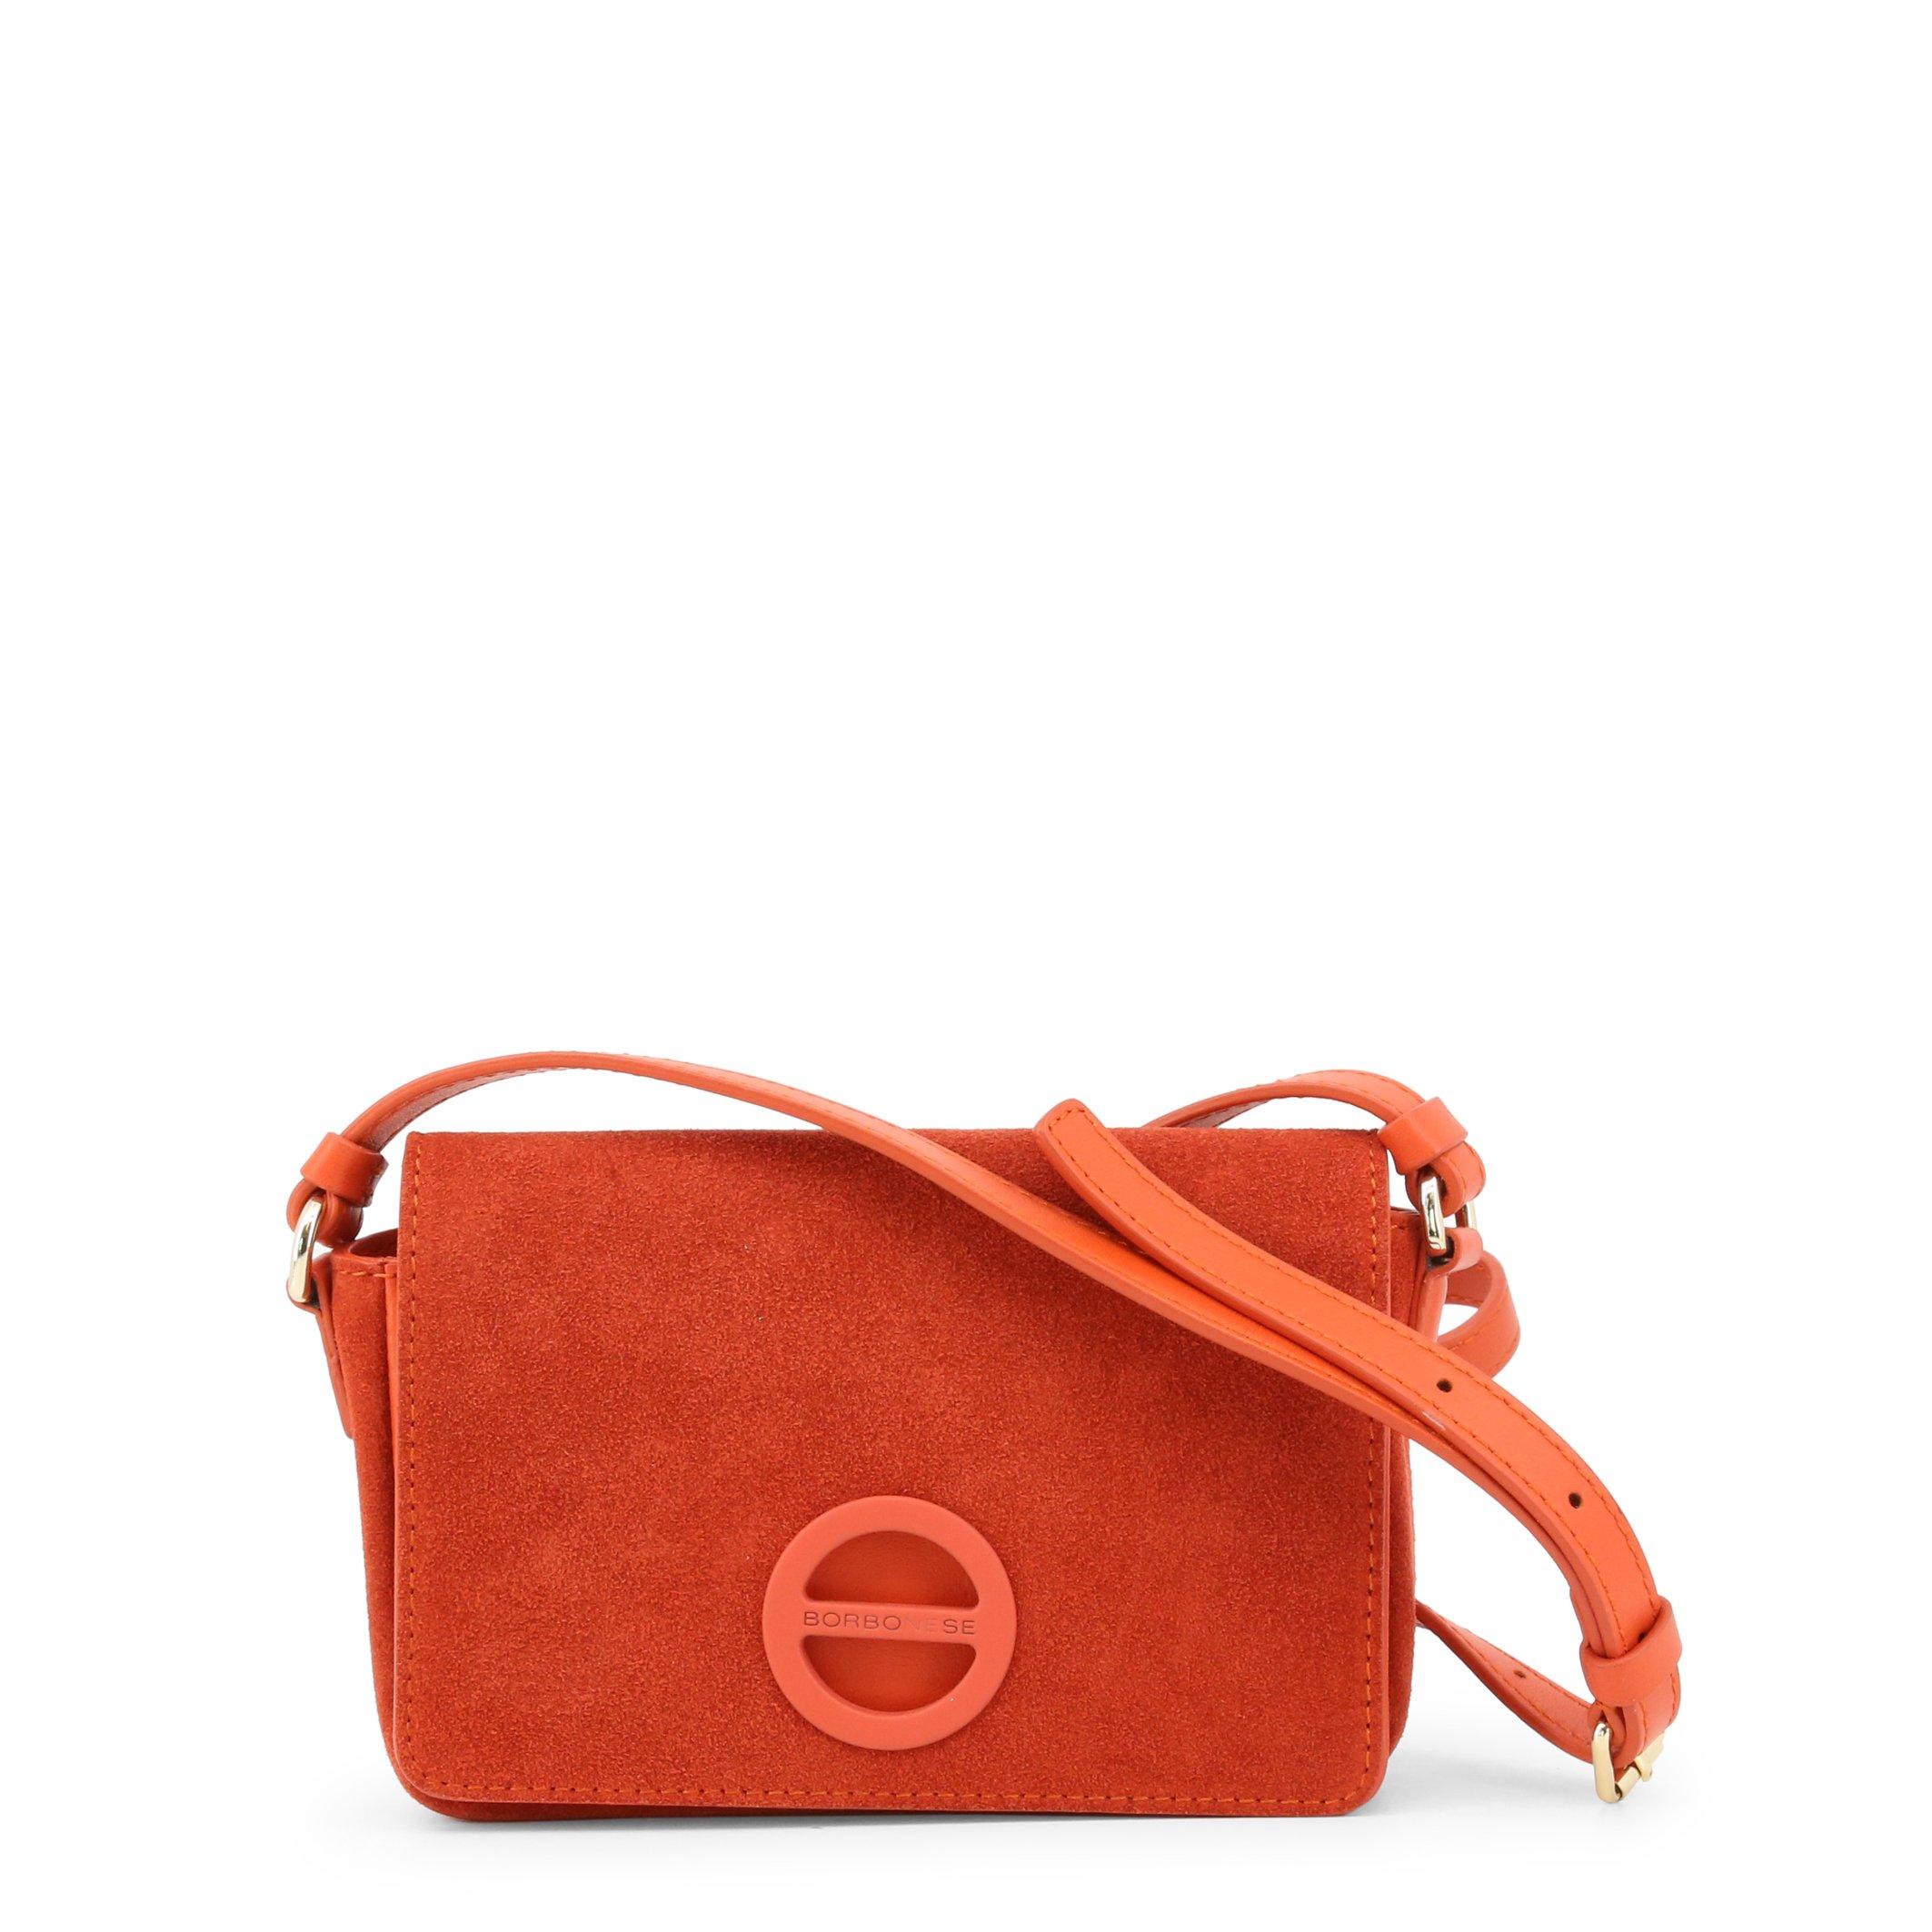 Borbonese Women's Crossbody Bag Various Colours 954816-J25 - red NOSIZE